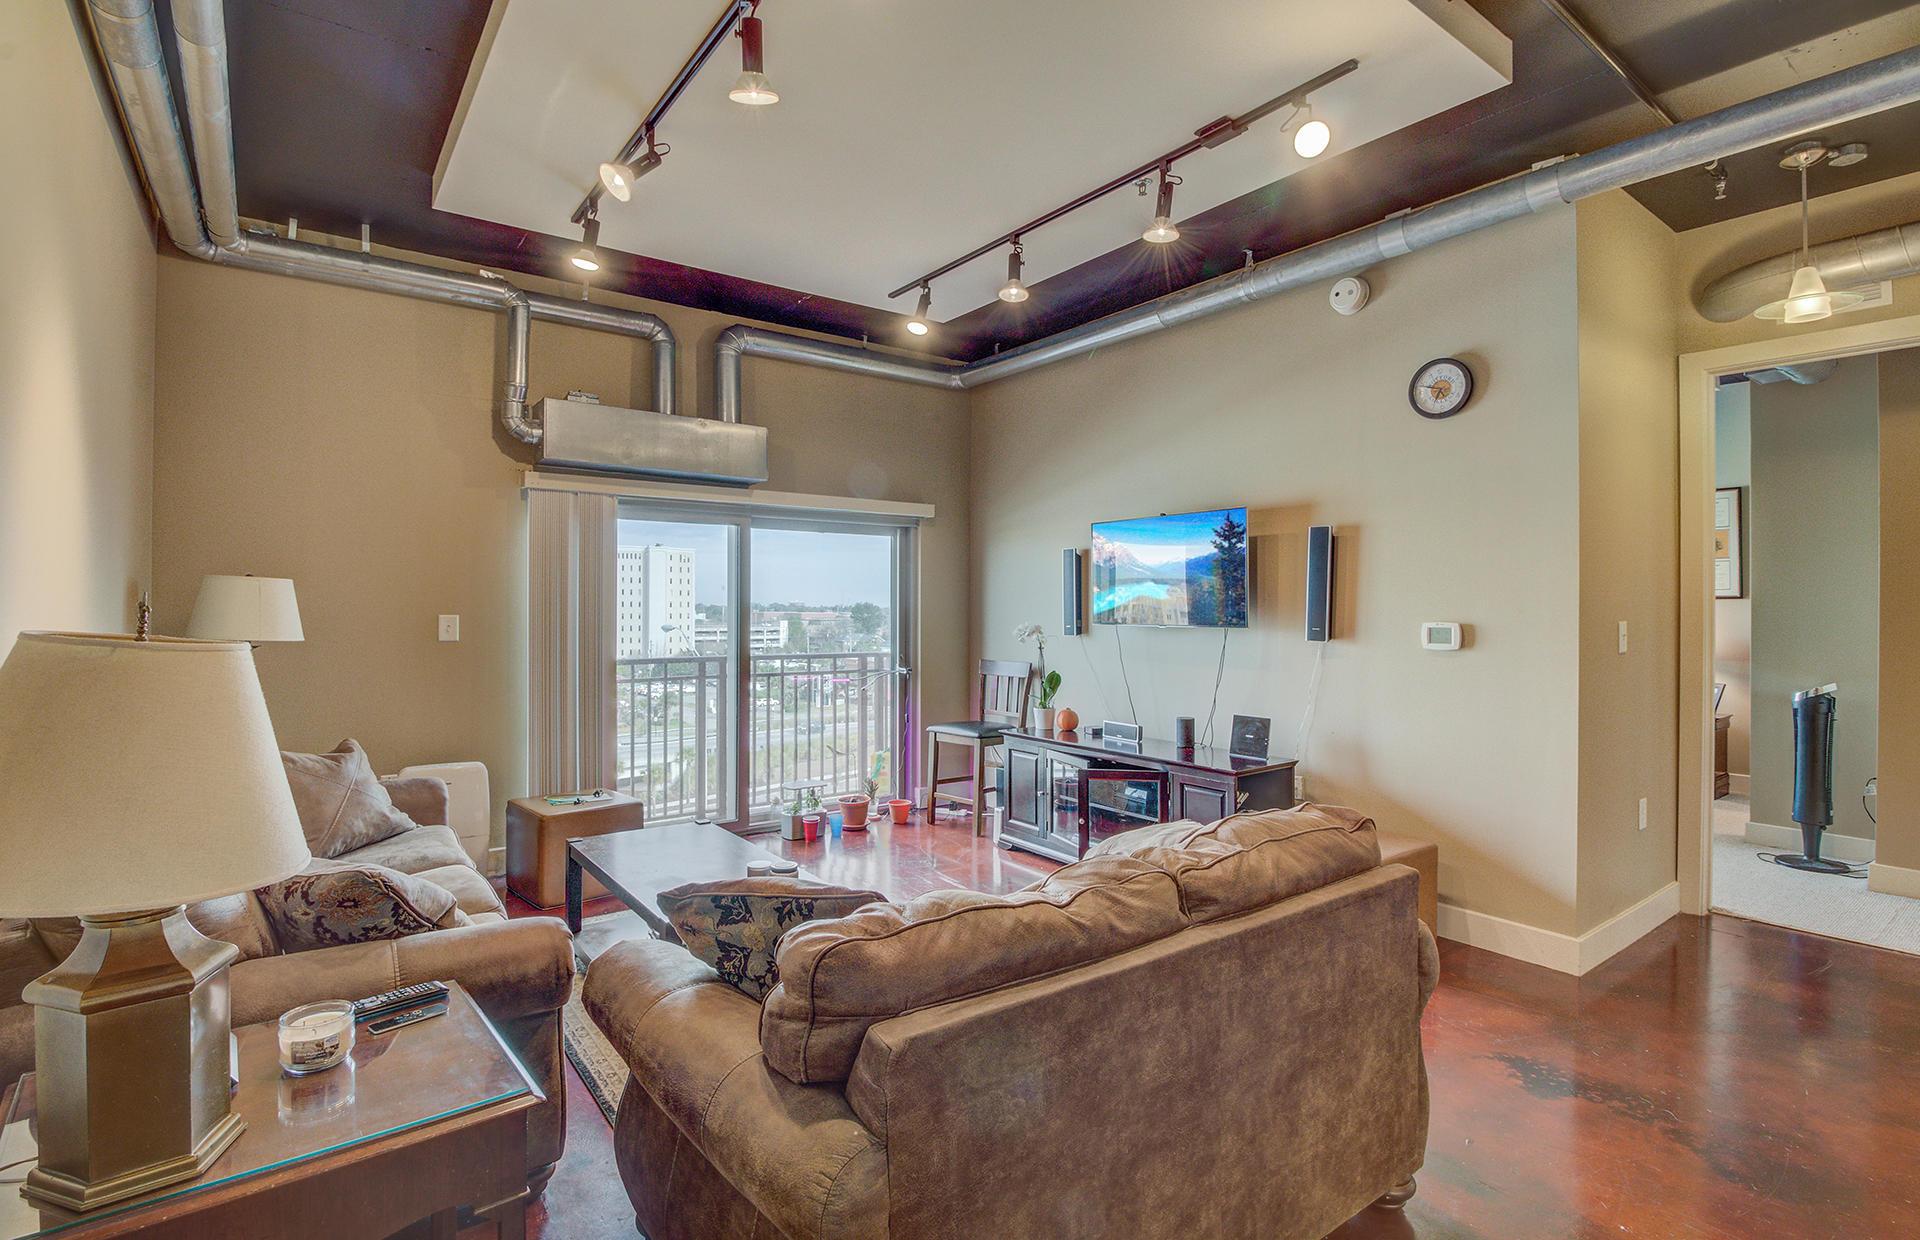 Bee Street Lofts Homes For Sale - 150 Bee, Charleston, SC - 11